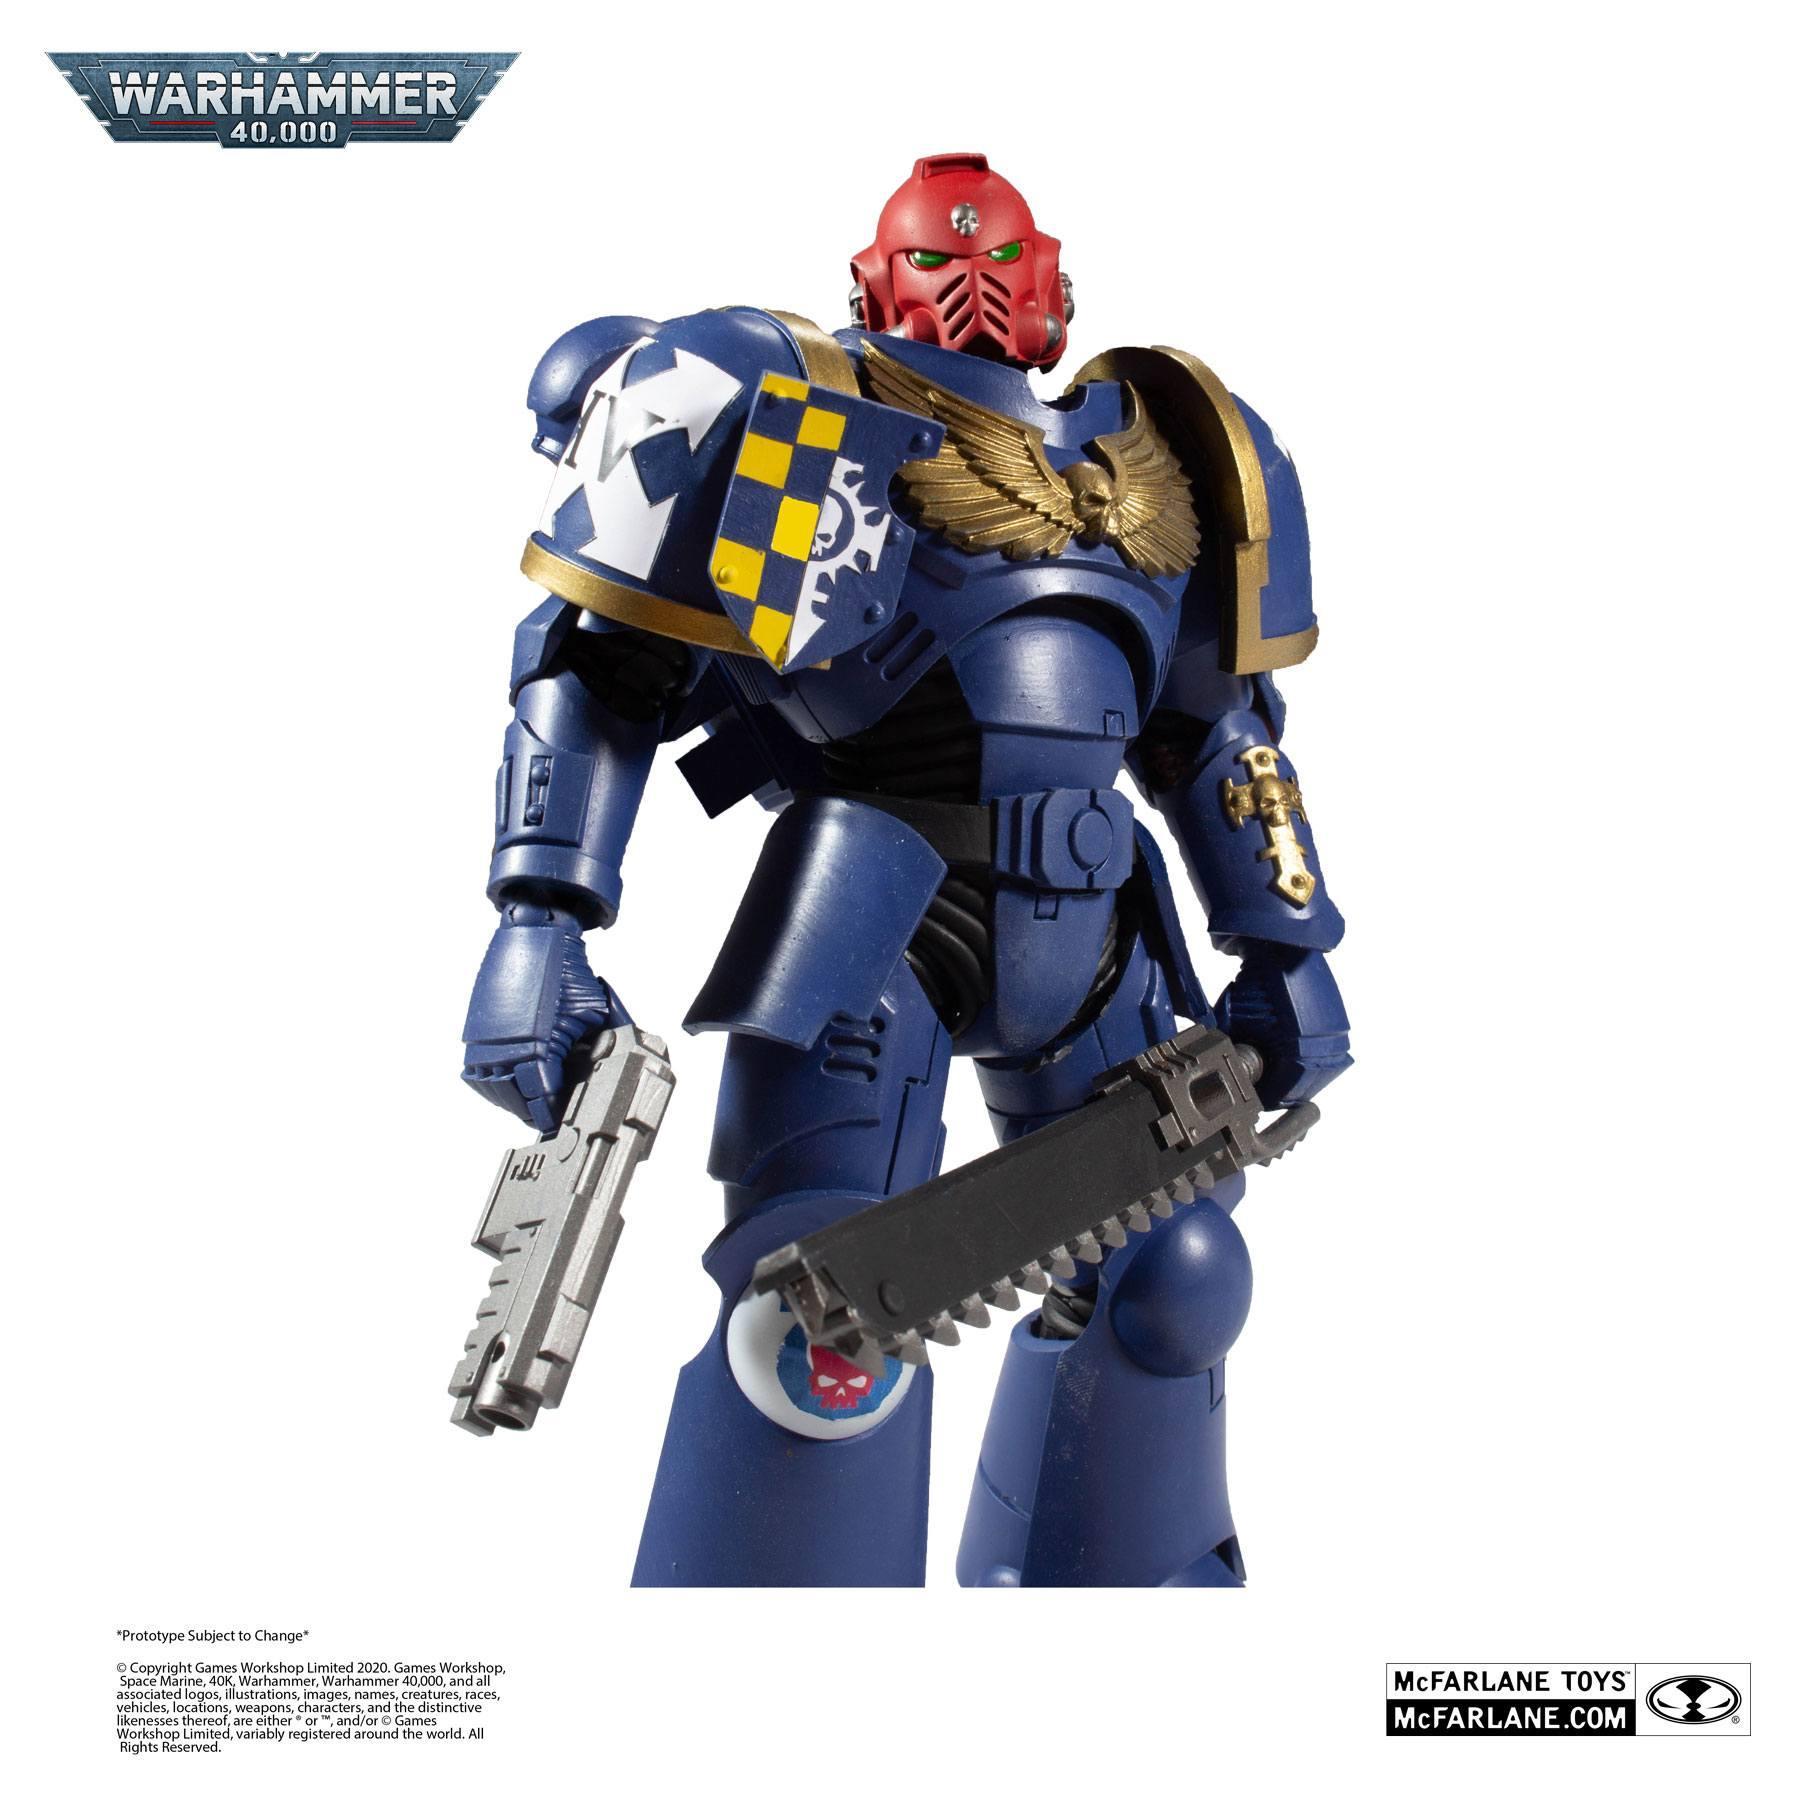 Suukoo toys figurine warhammer marine space 5